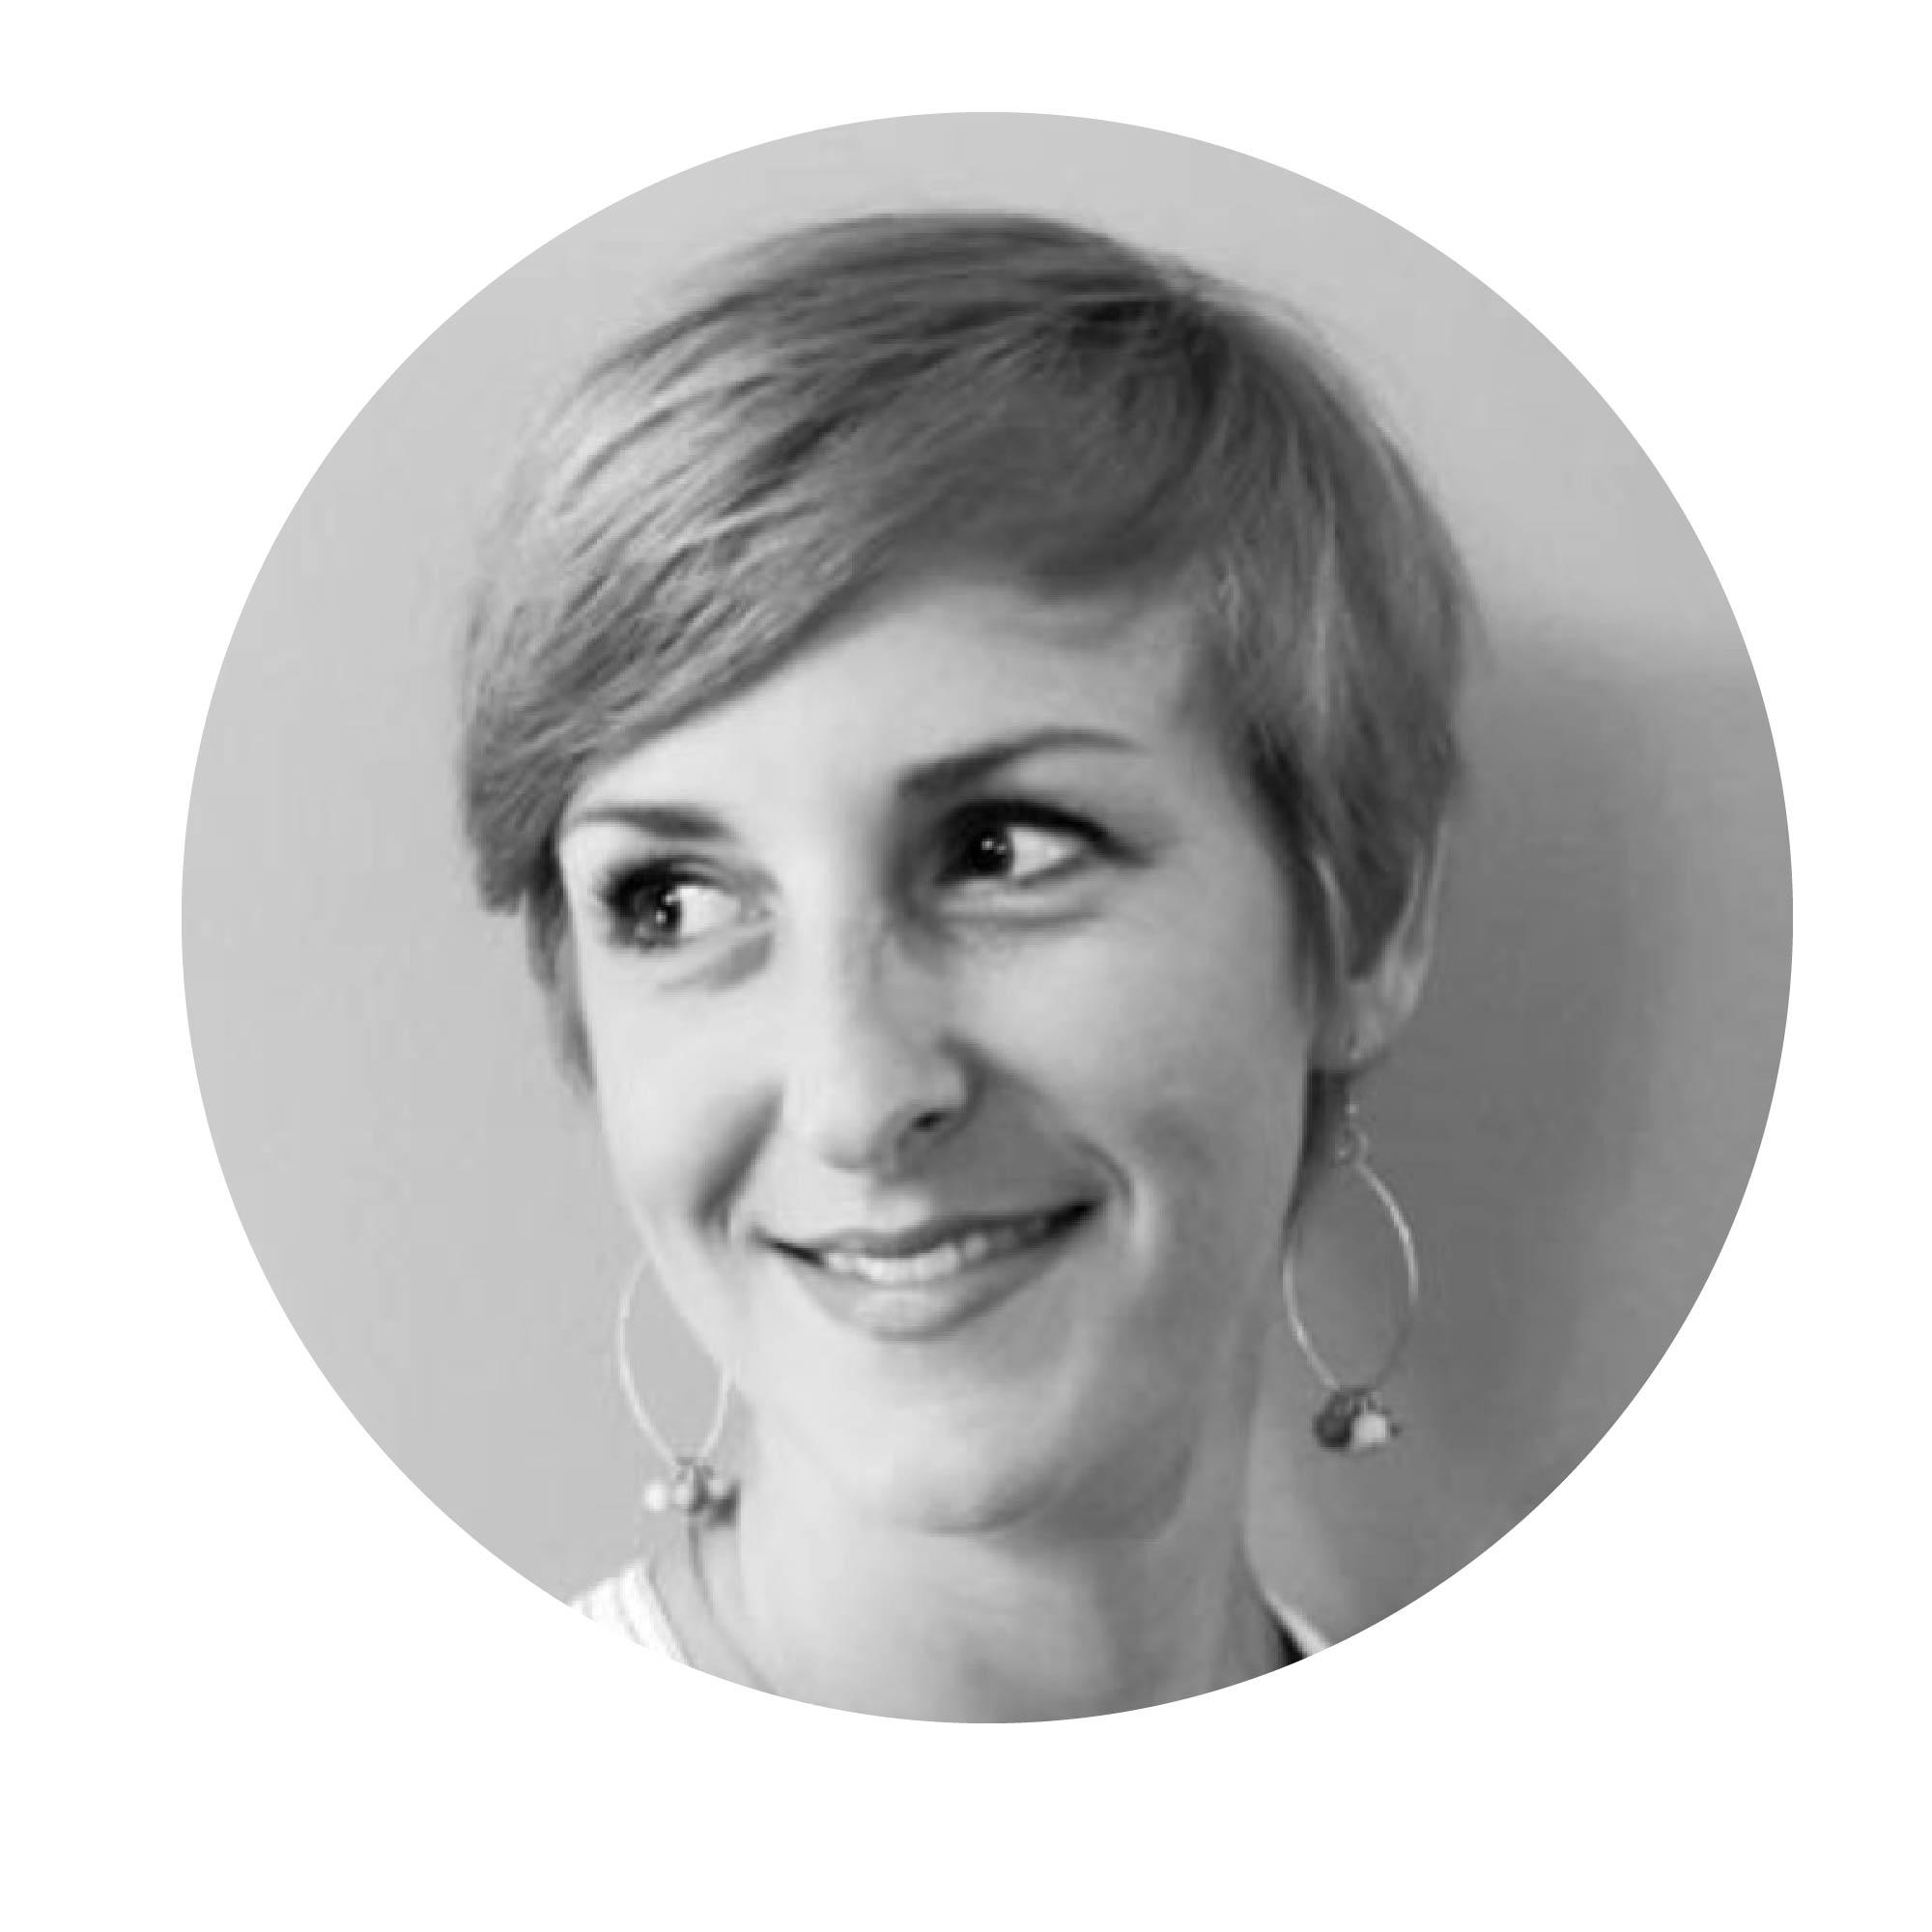 Amanda Barnes (registered dietician @ Amanda barnes nutrition) -